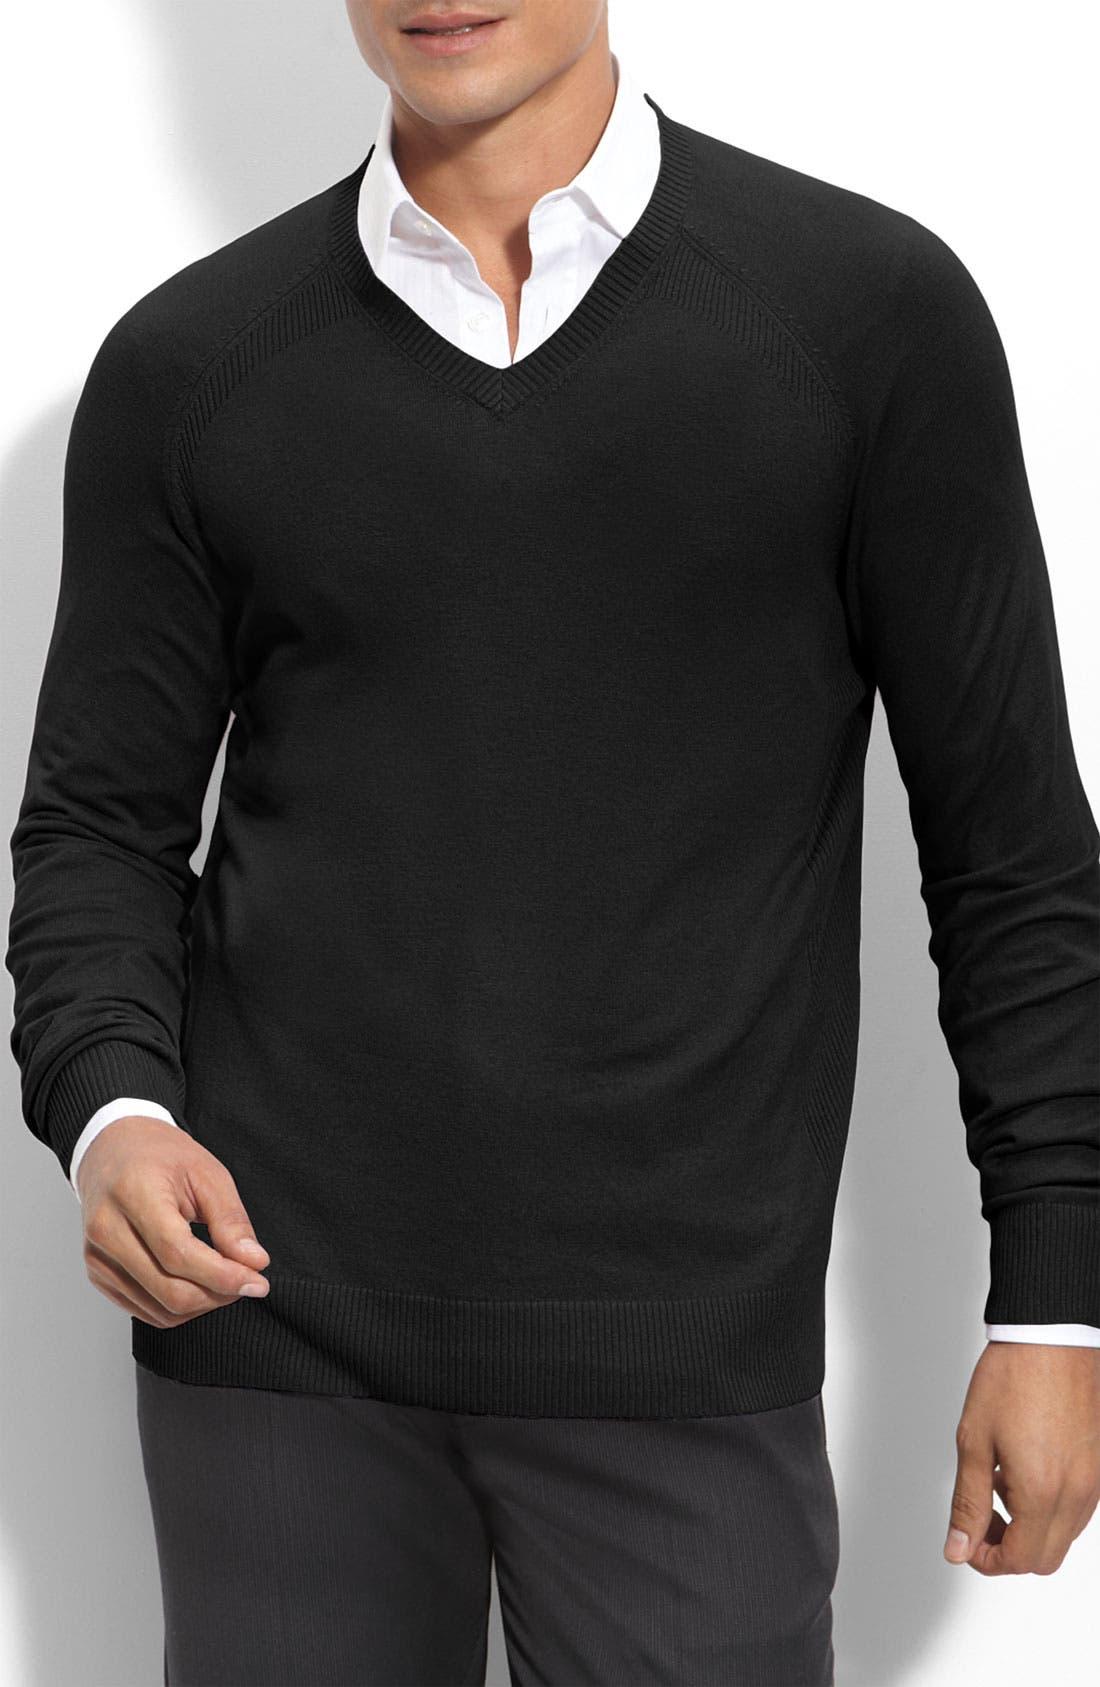 Main Image - Calibrate Trim Fit Cotton Blend V-Neck Sweater